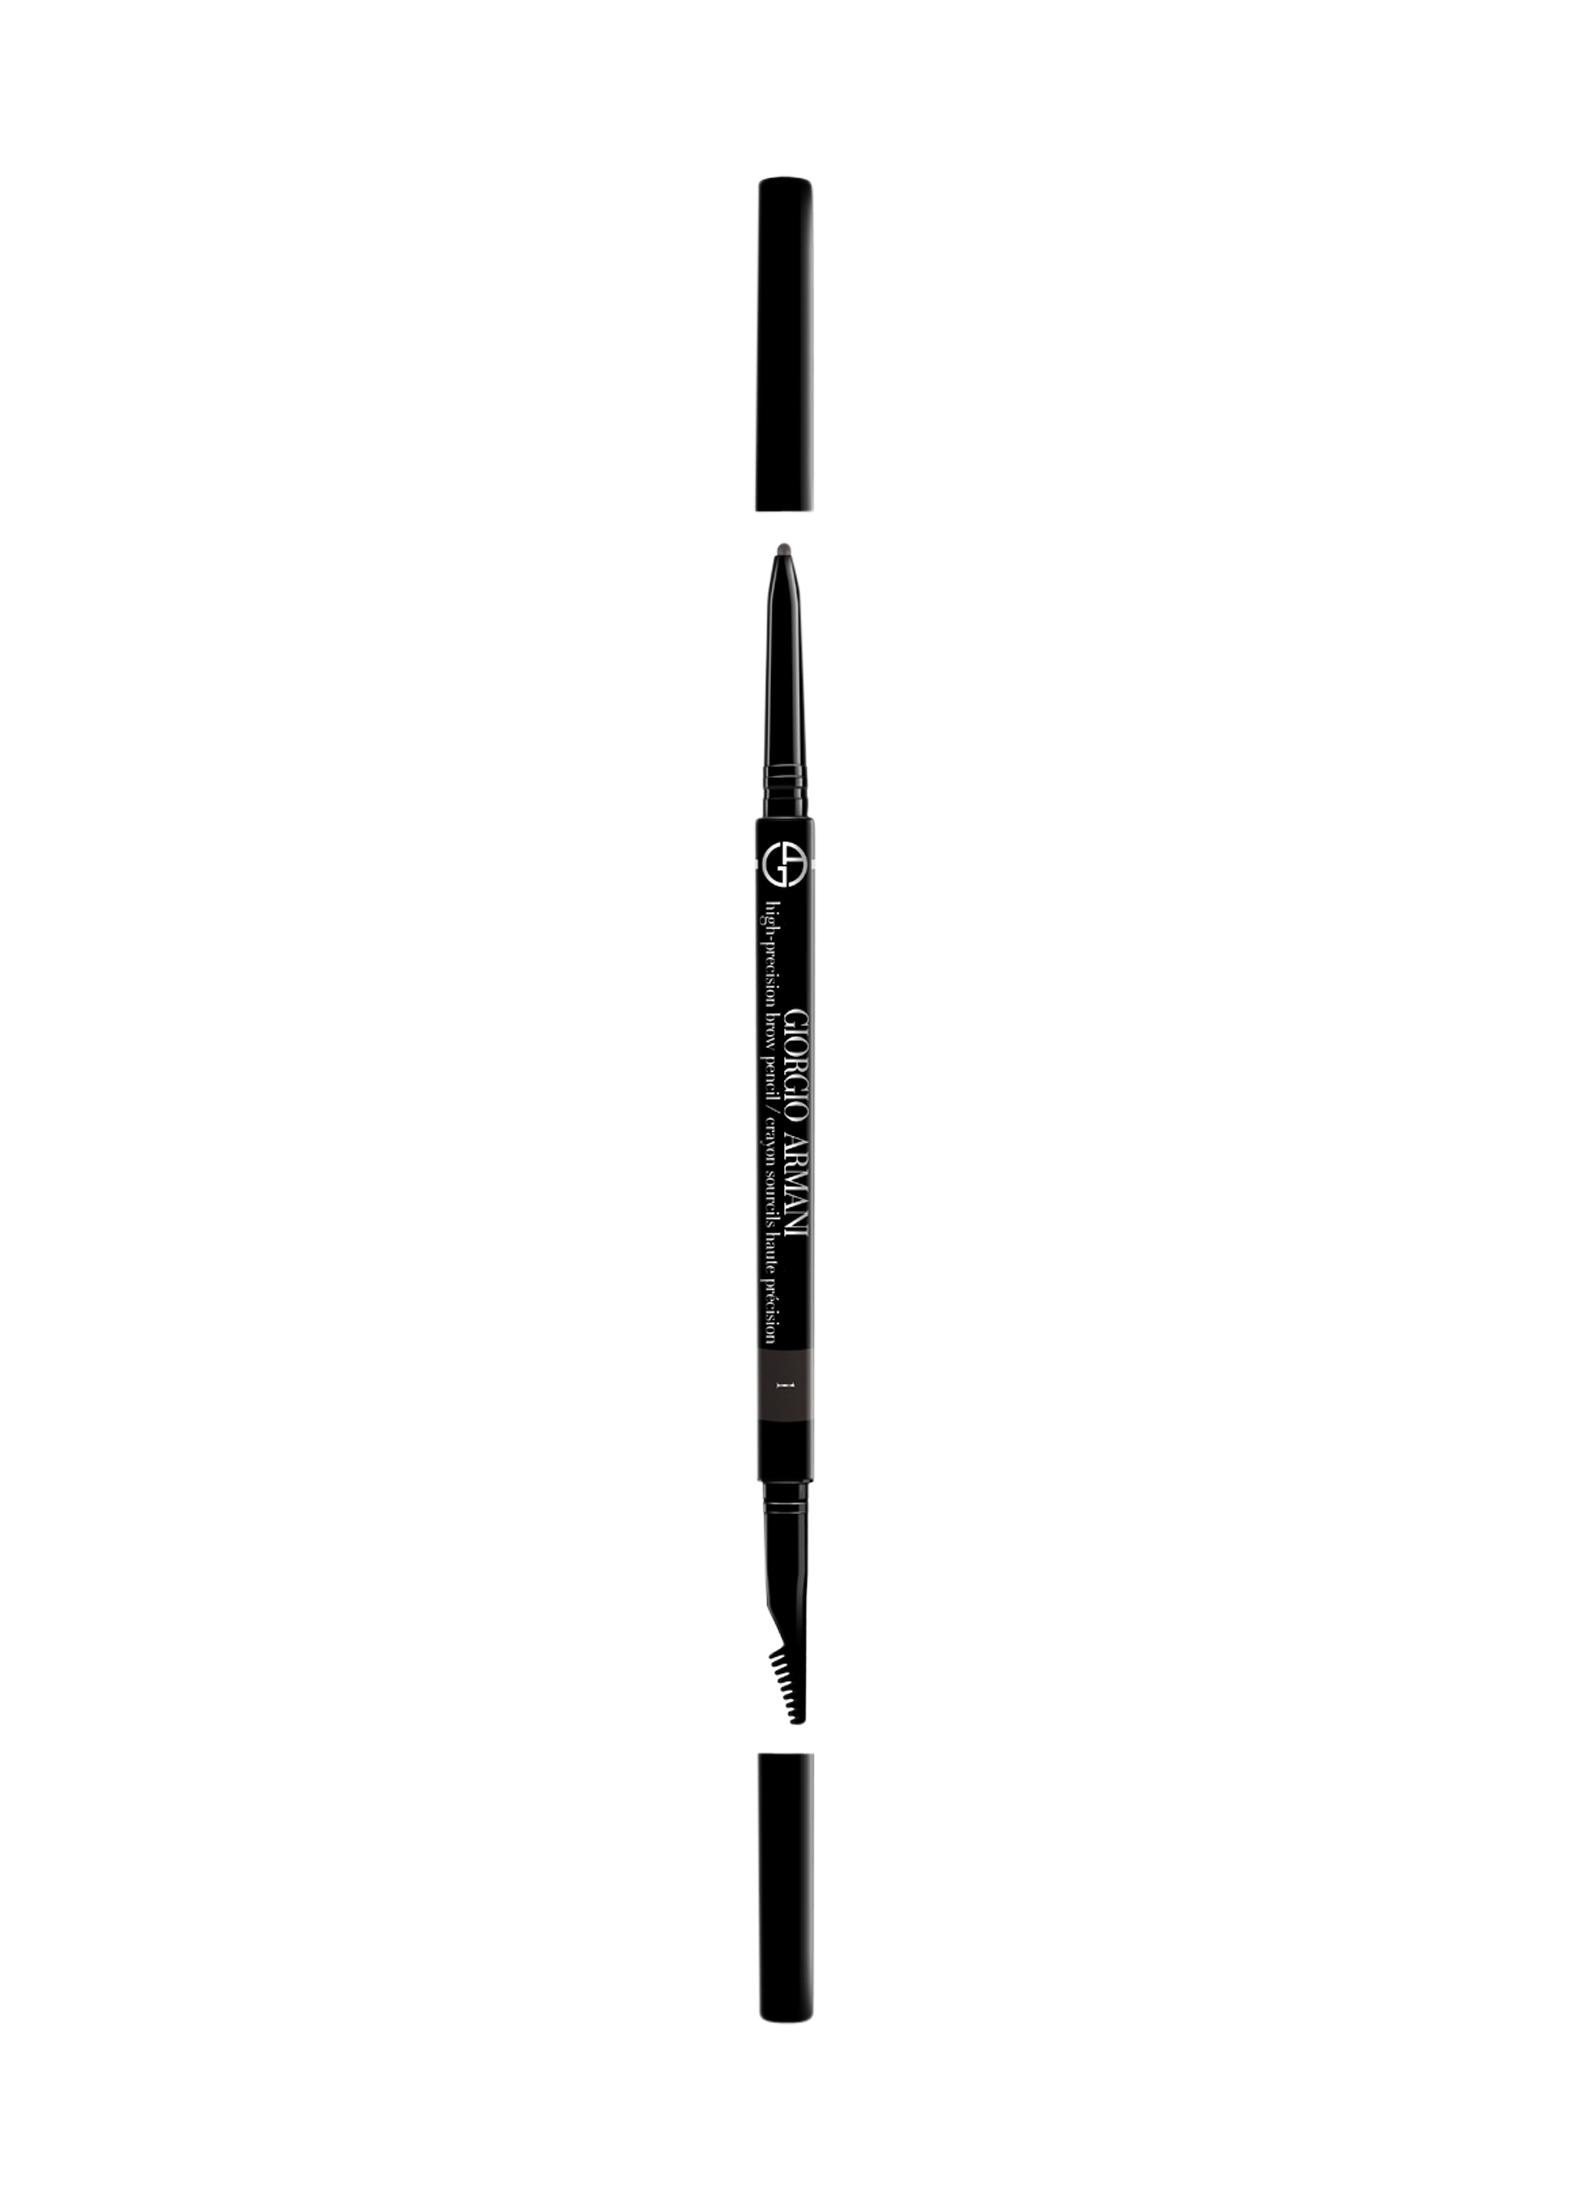 Giorgio Armani, High Precision Brow Pencil image number 0